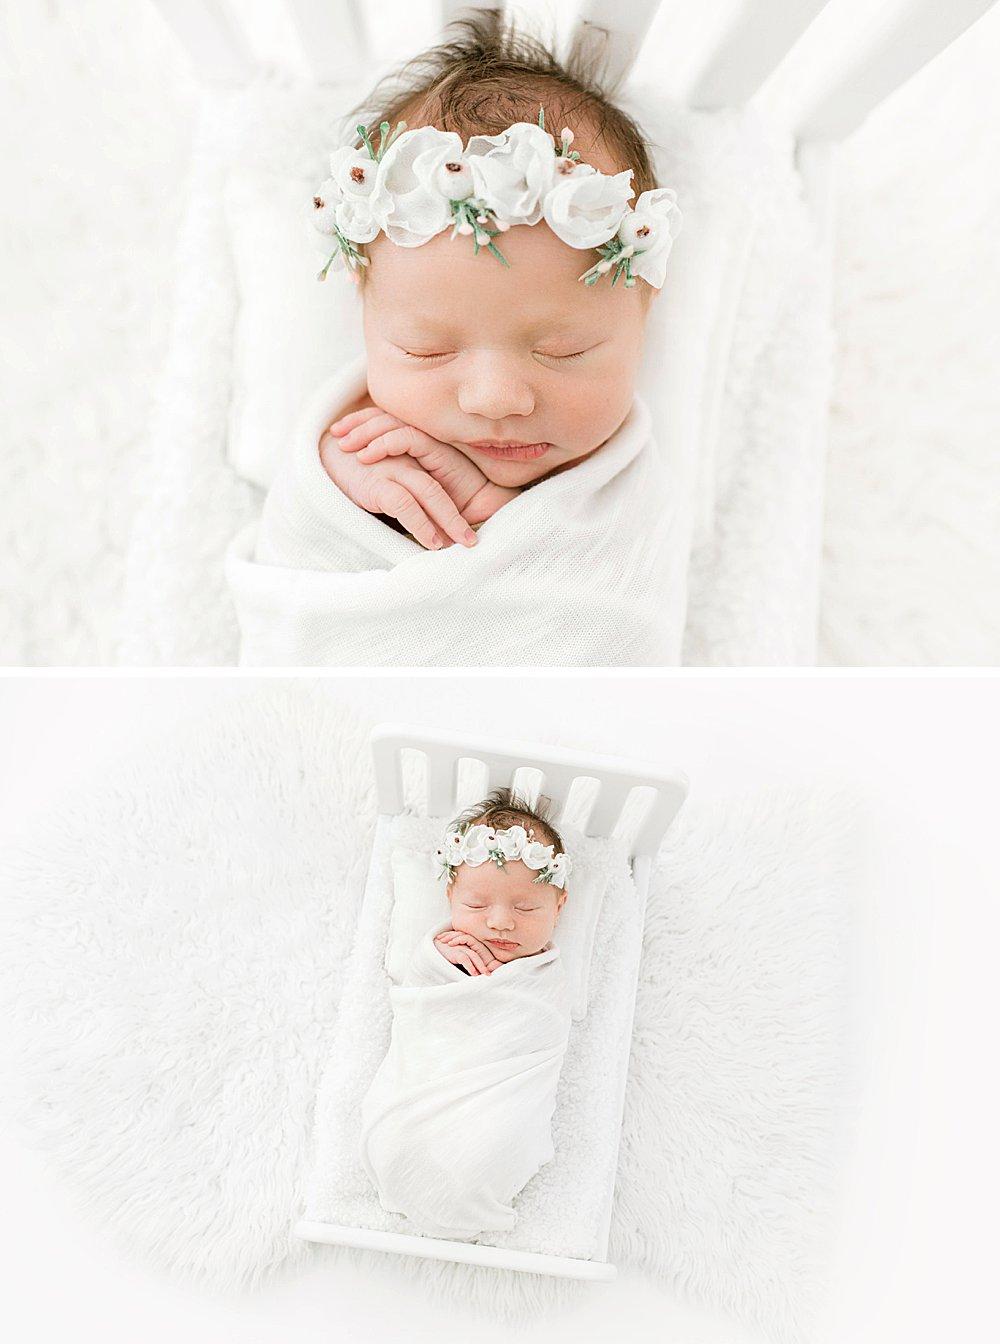 Baby girl in white newborn bed